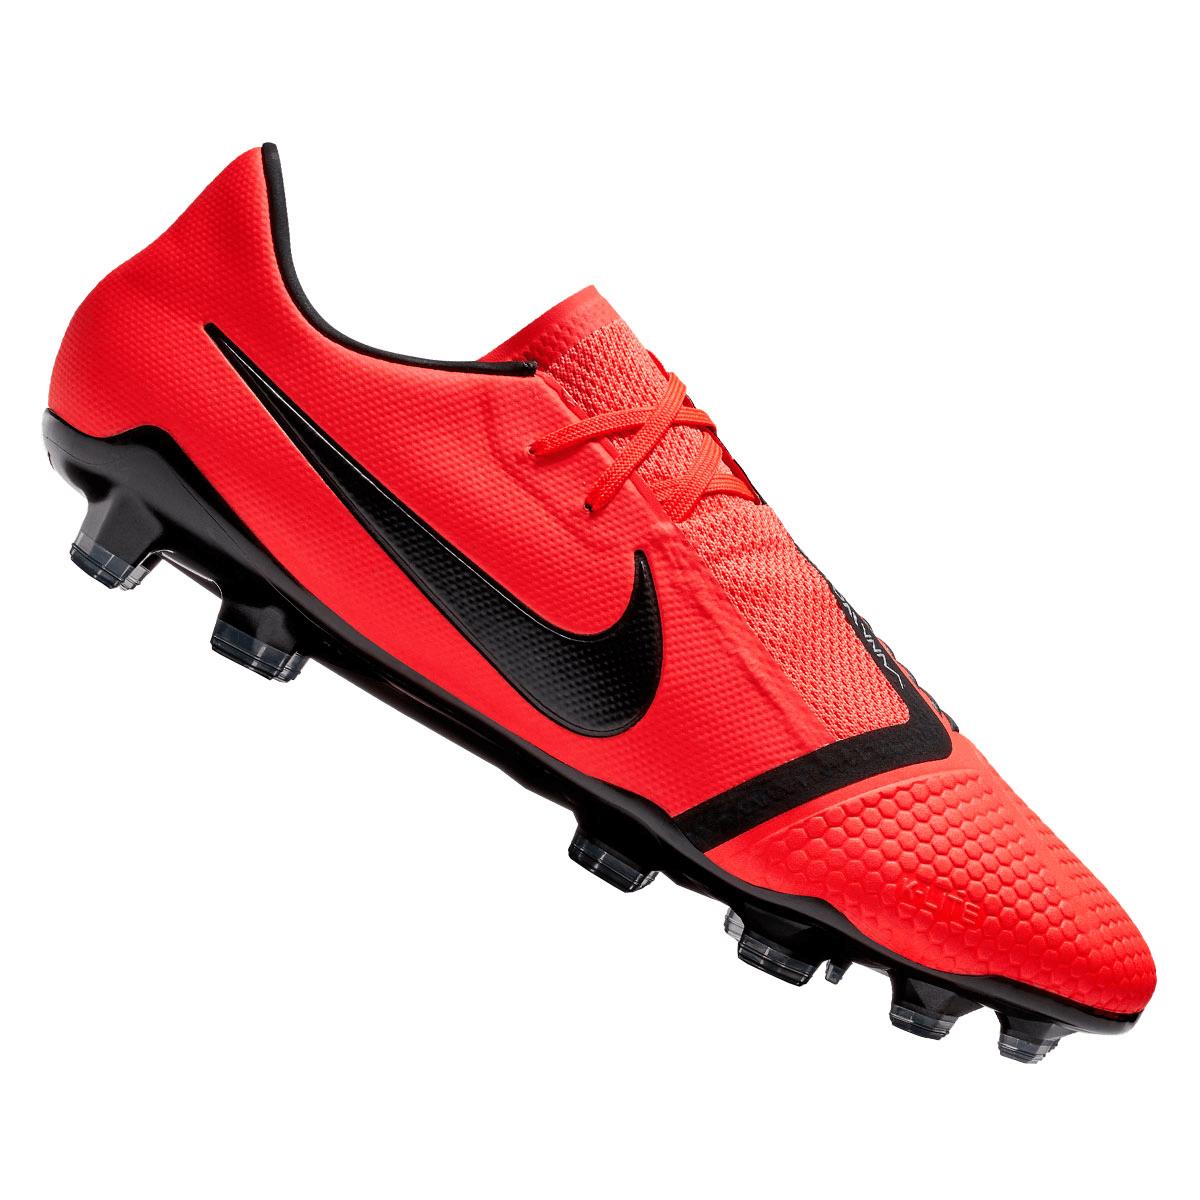 buy good official shop newest Nike Fußballschuh Phantom Venom Pro FG rot/schwarz - Fussball Shop